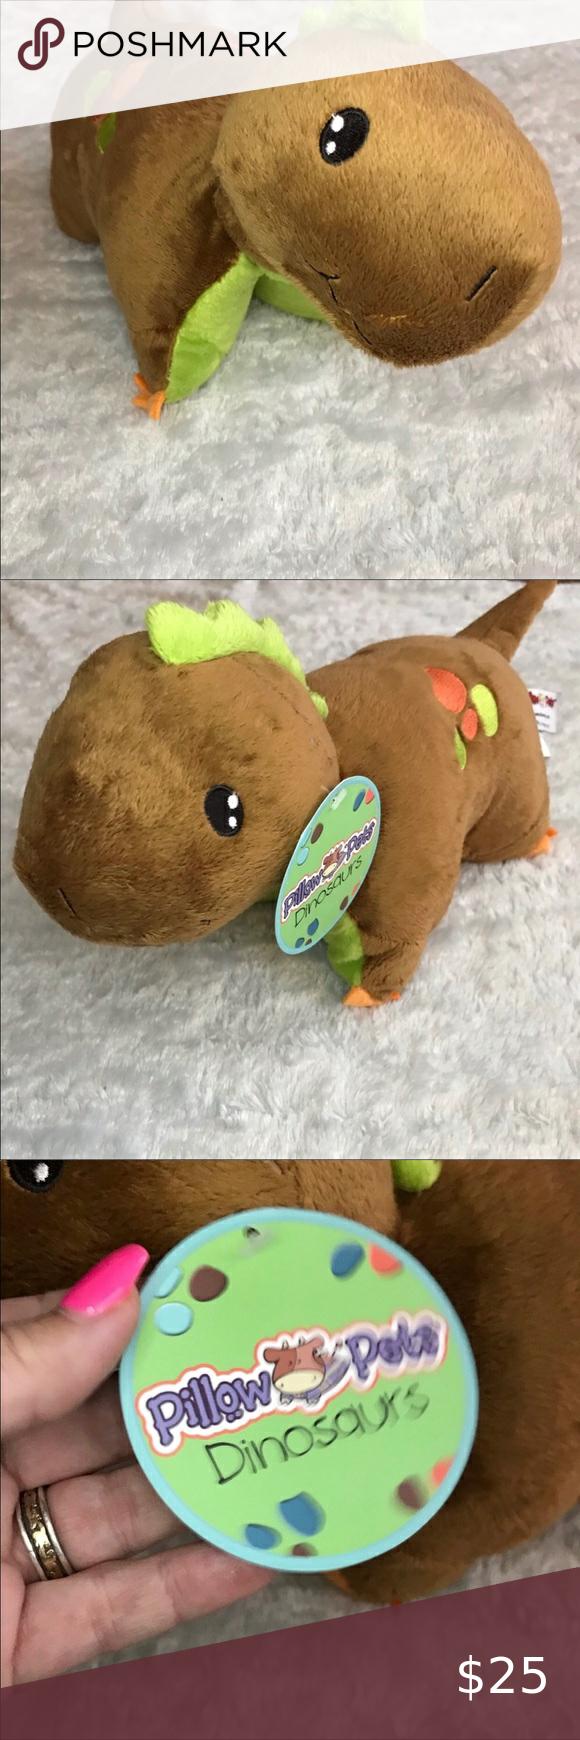 my pillow pet brown and green dinosaur